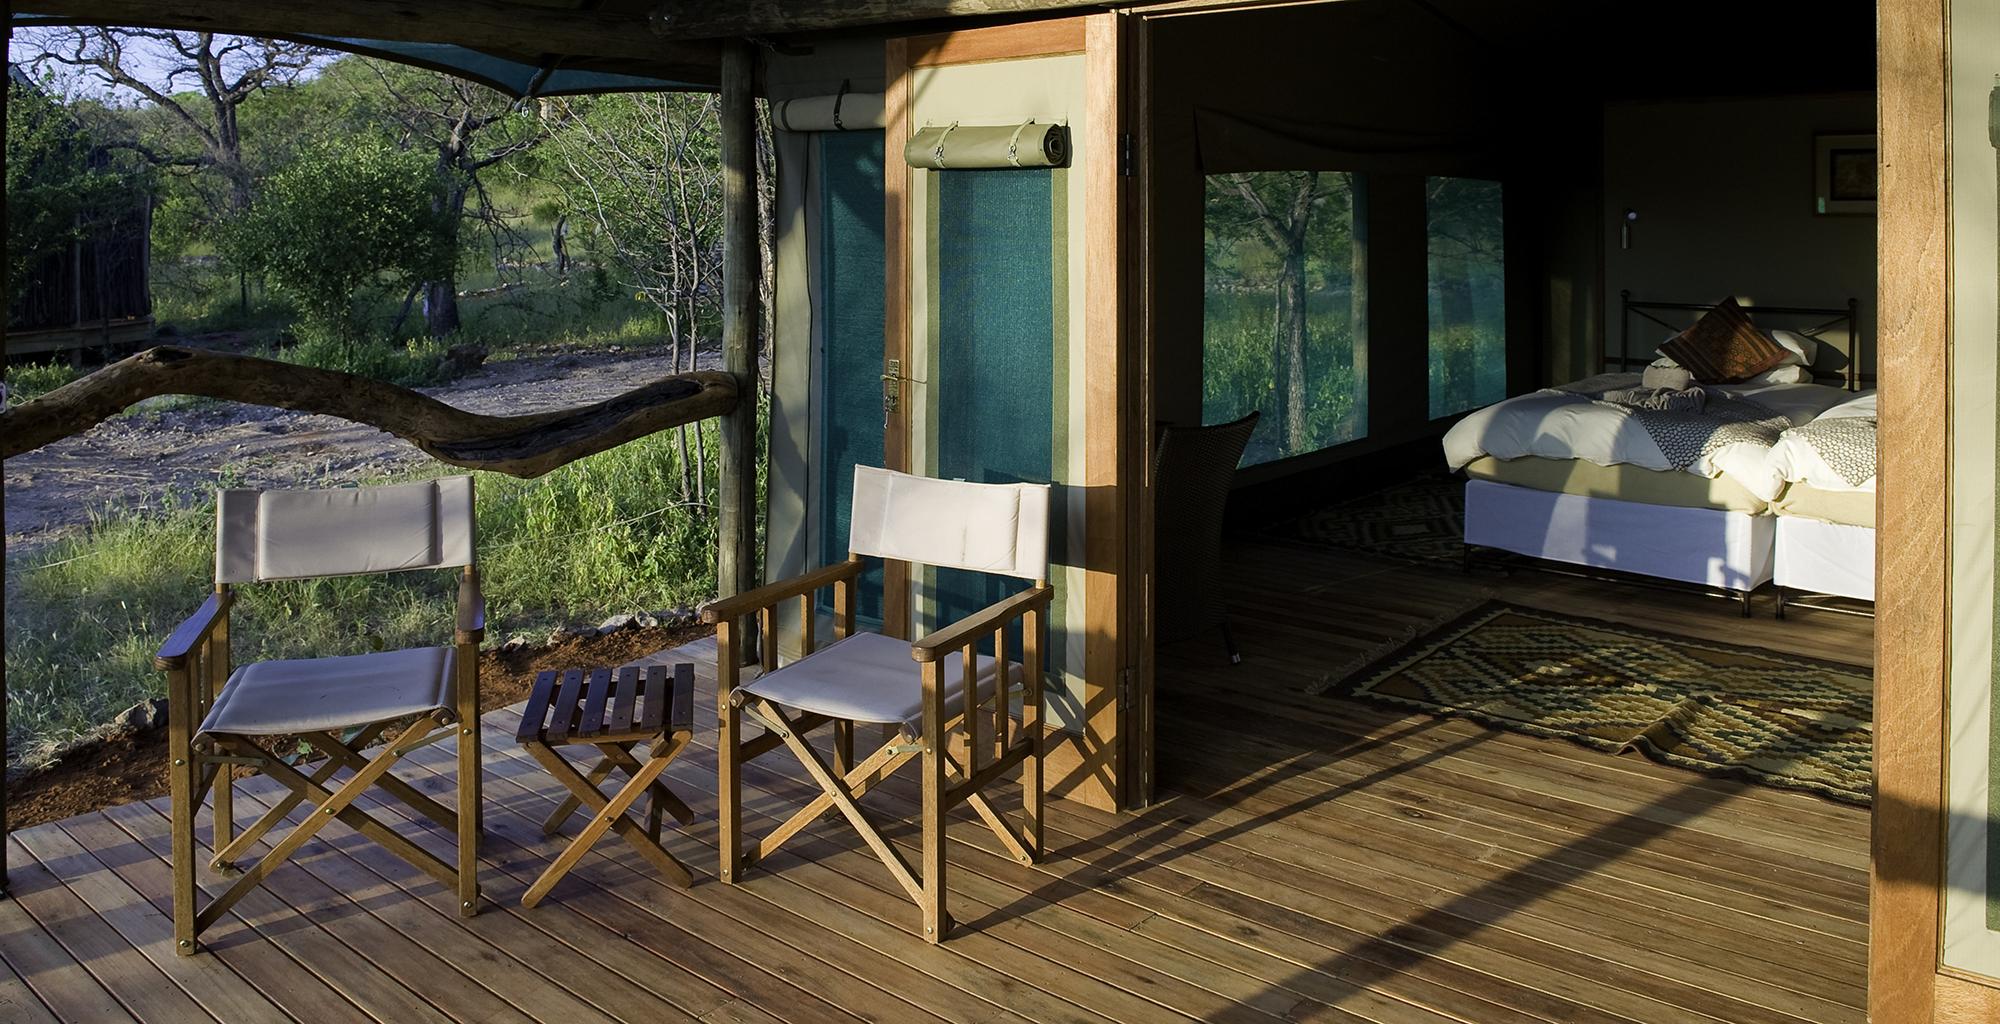 Namibia-Ongava-Tented-Camp-Beds-Exterior